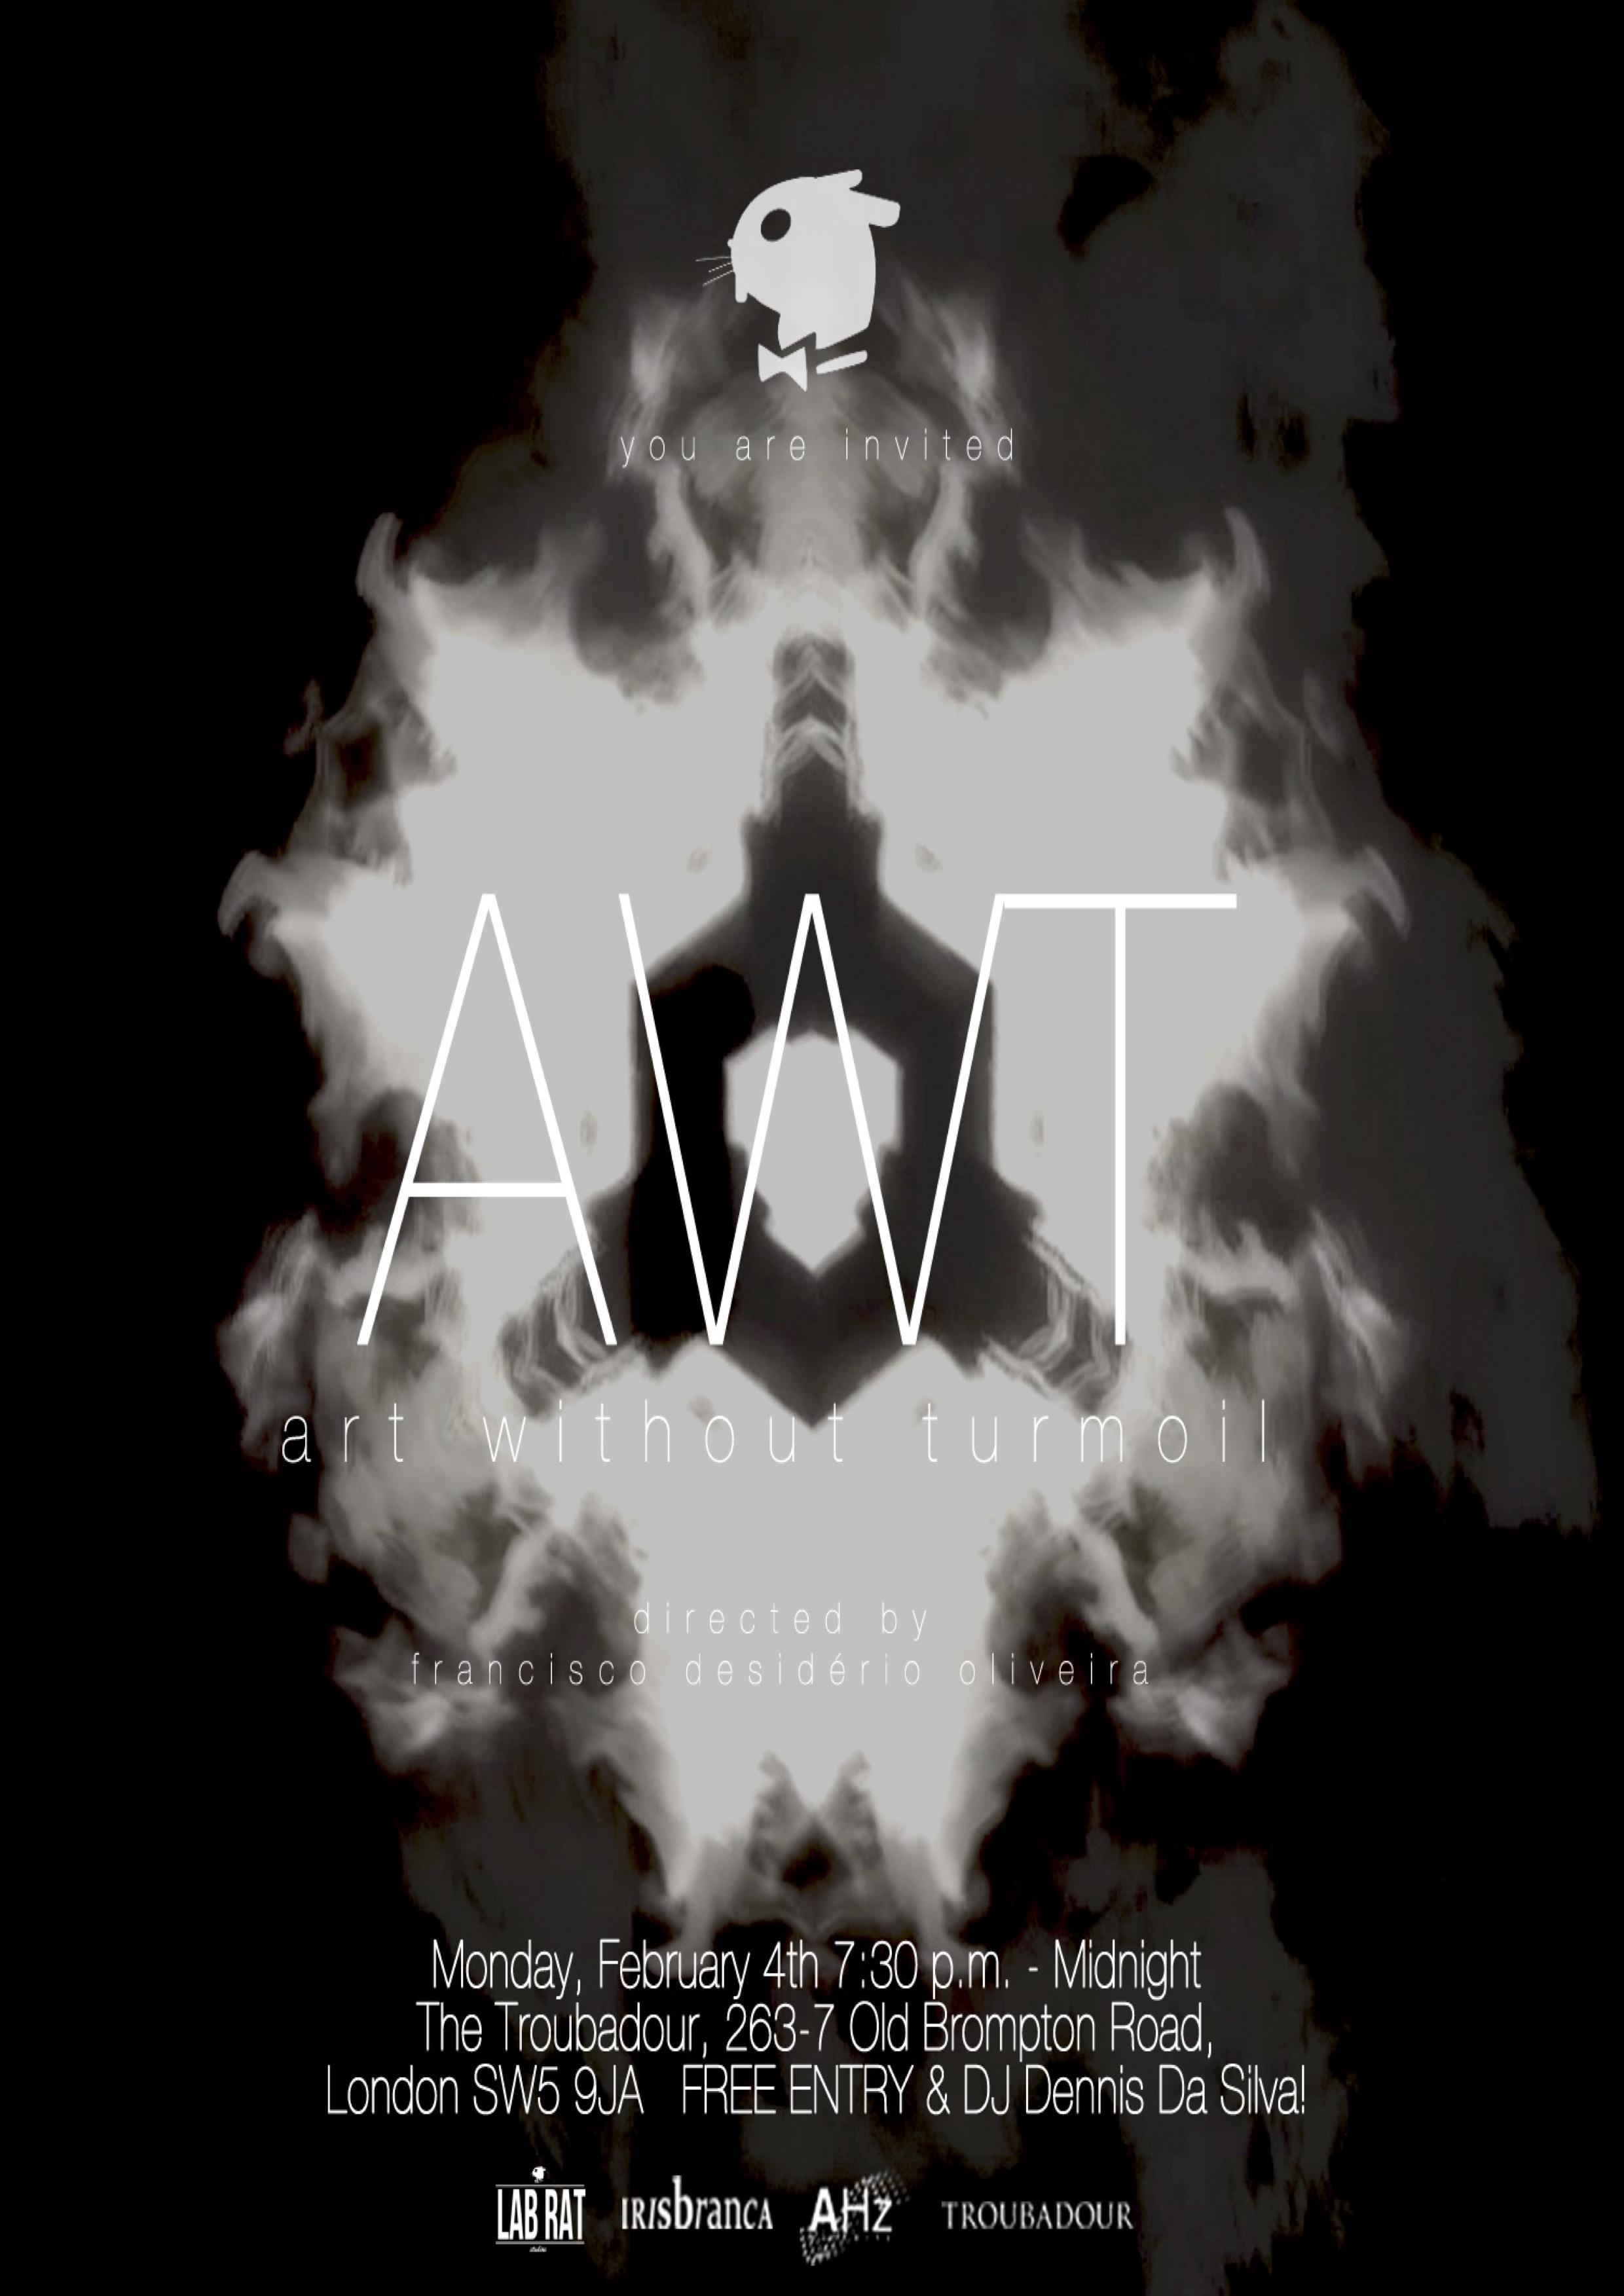 Art Without Turmoil 2013